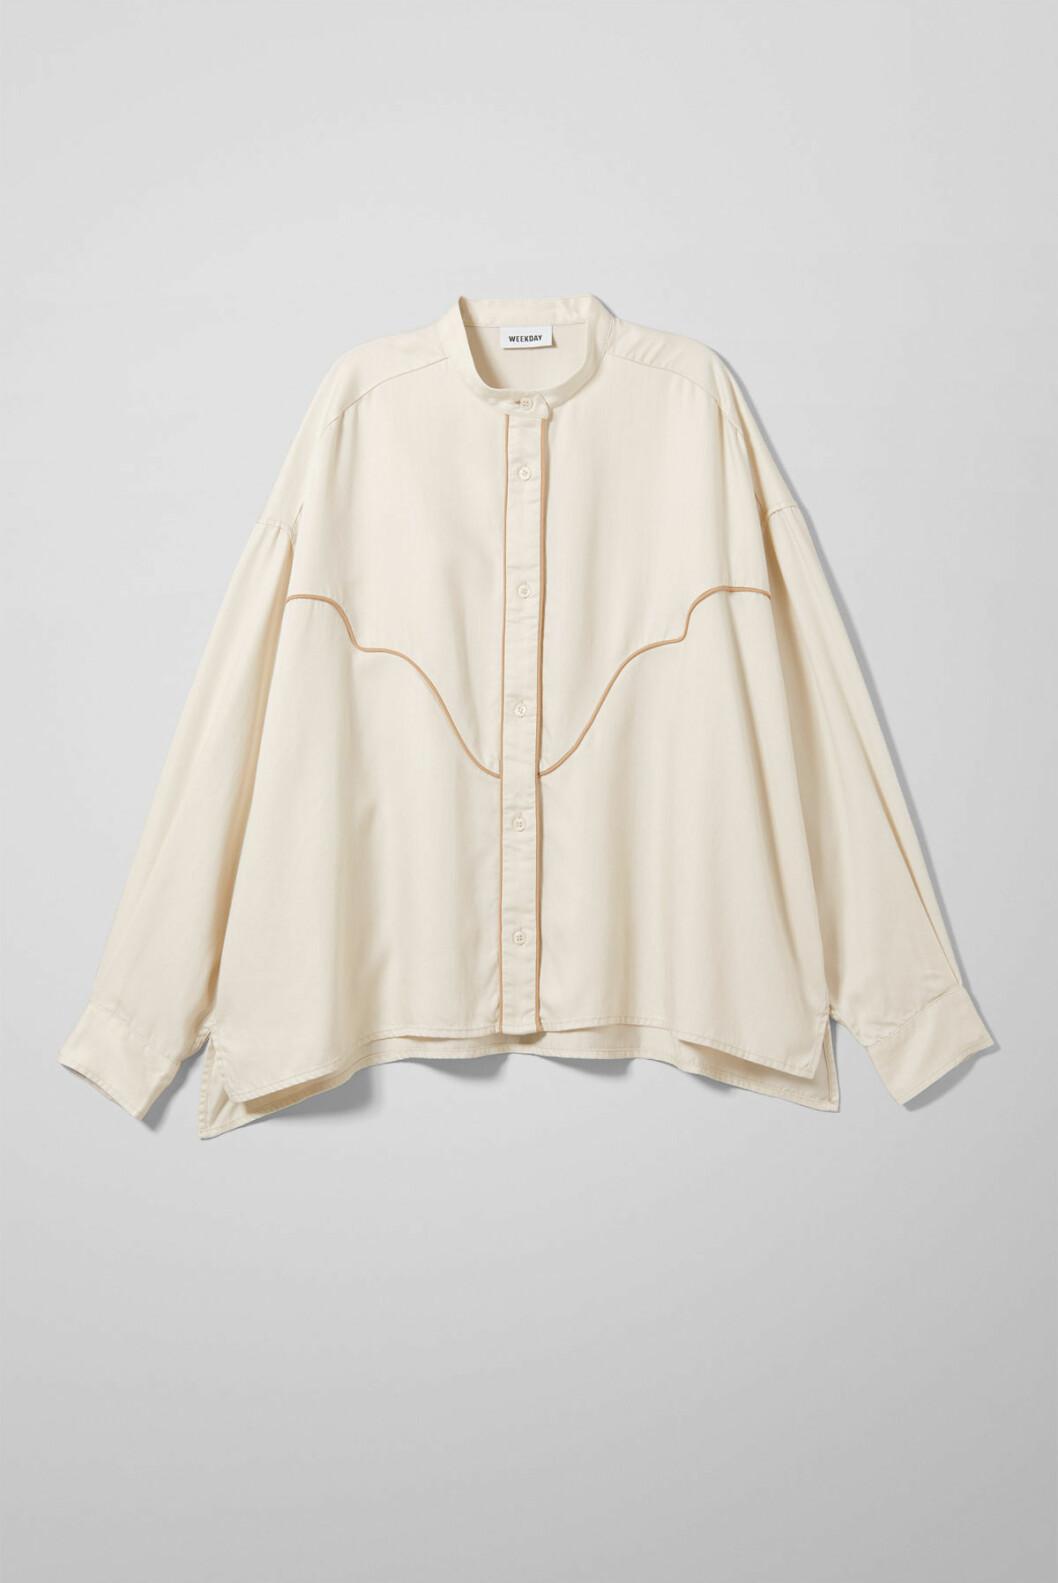 Skjorte fra Weekday |450,-| https://www.weekday.com/en_sek/women/categories/new-arrivals/product.tessa-shirt-beige.0688362001.html